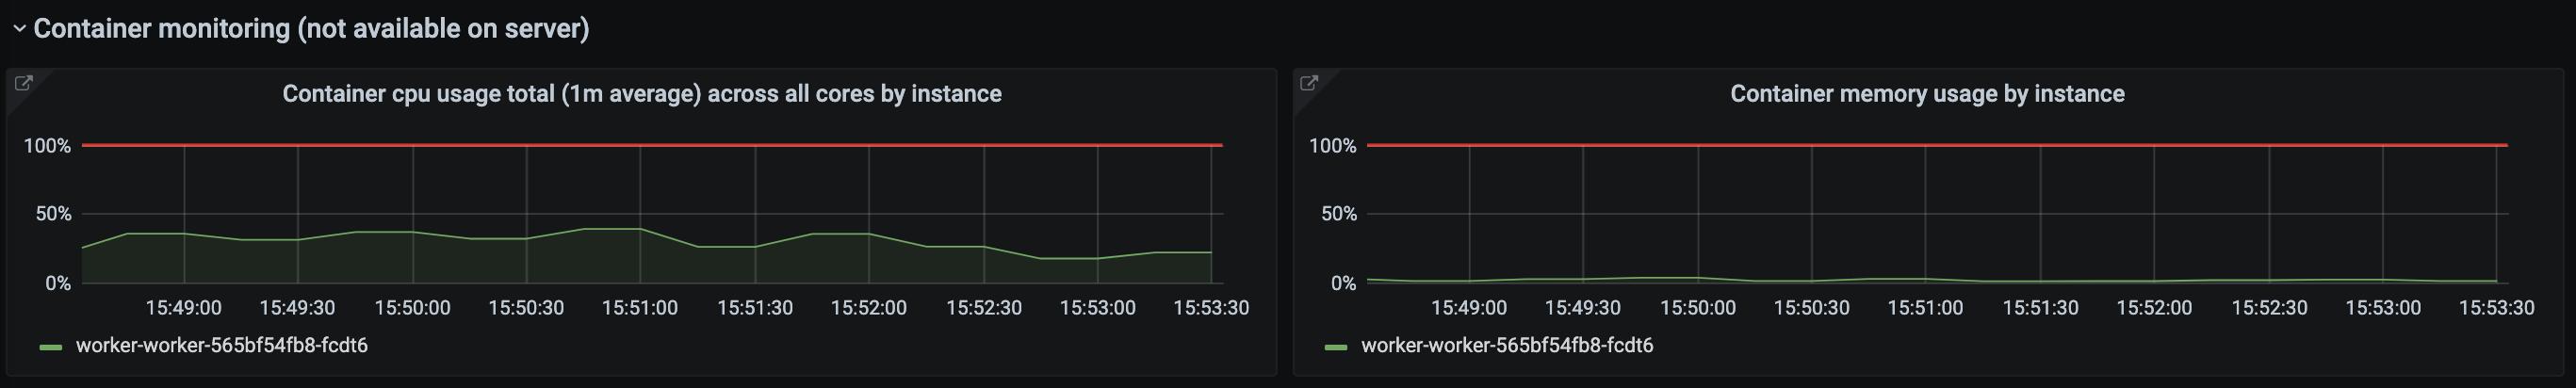 Worker resource usage panels (single instance)